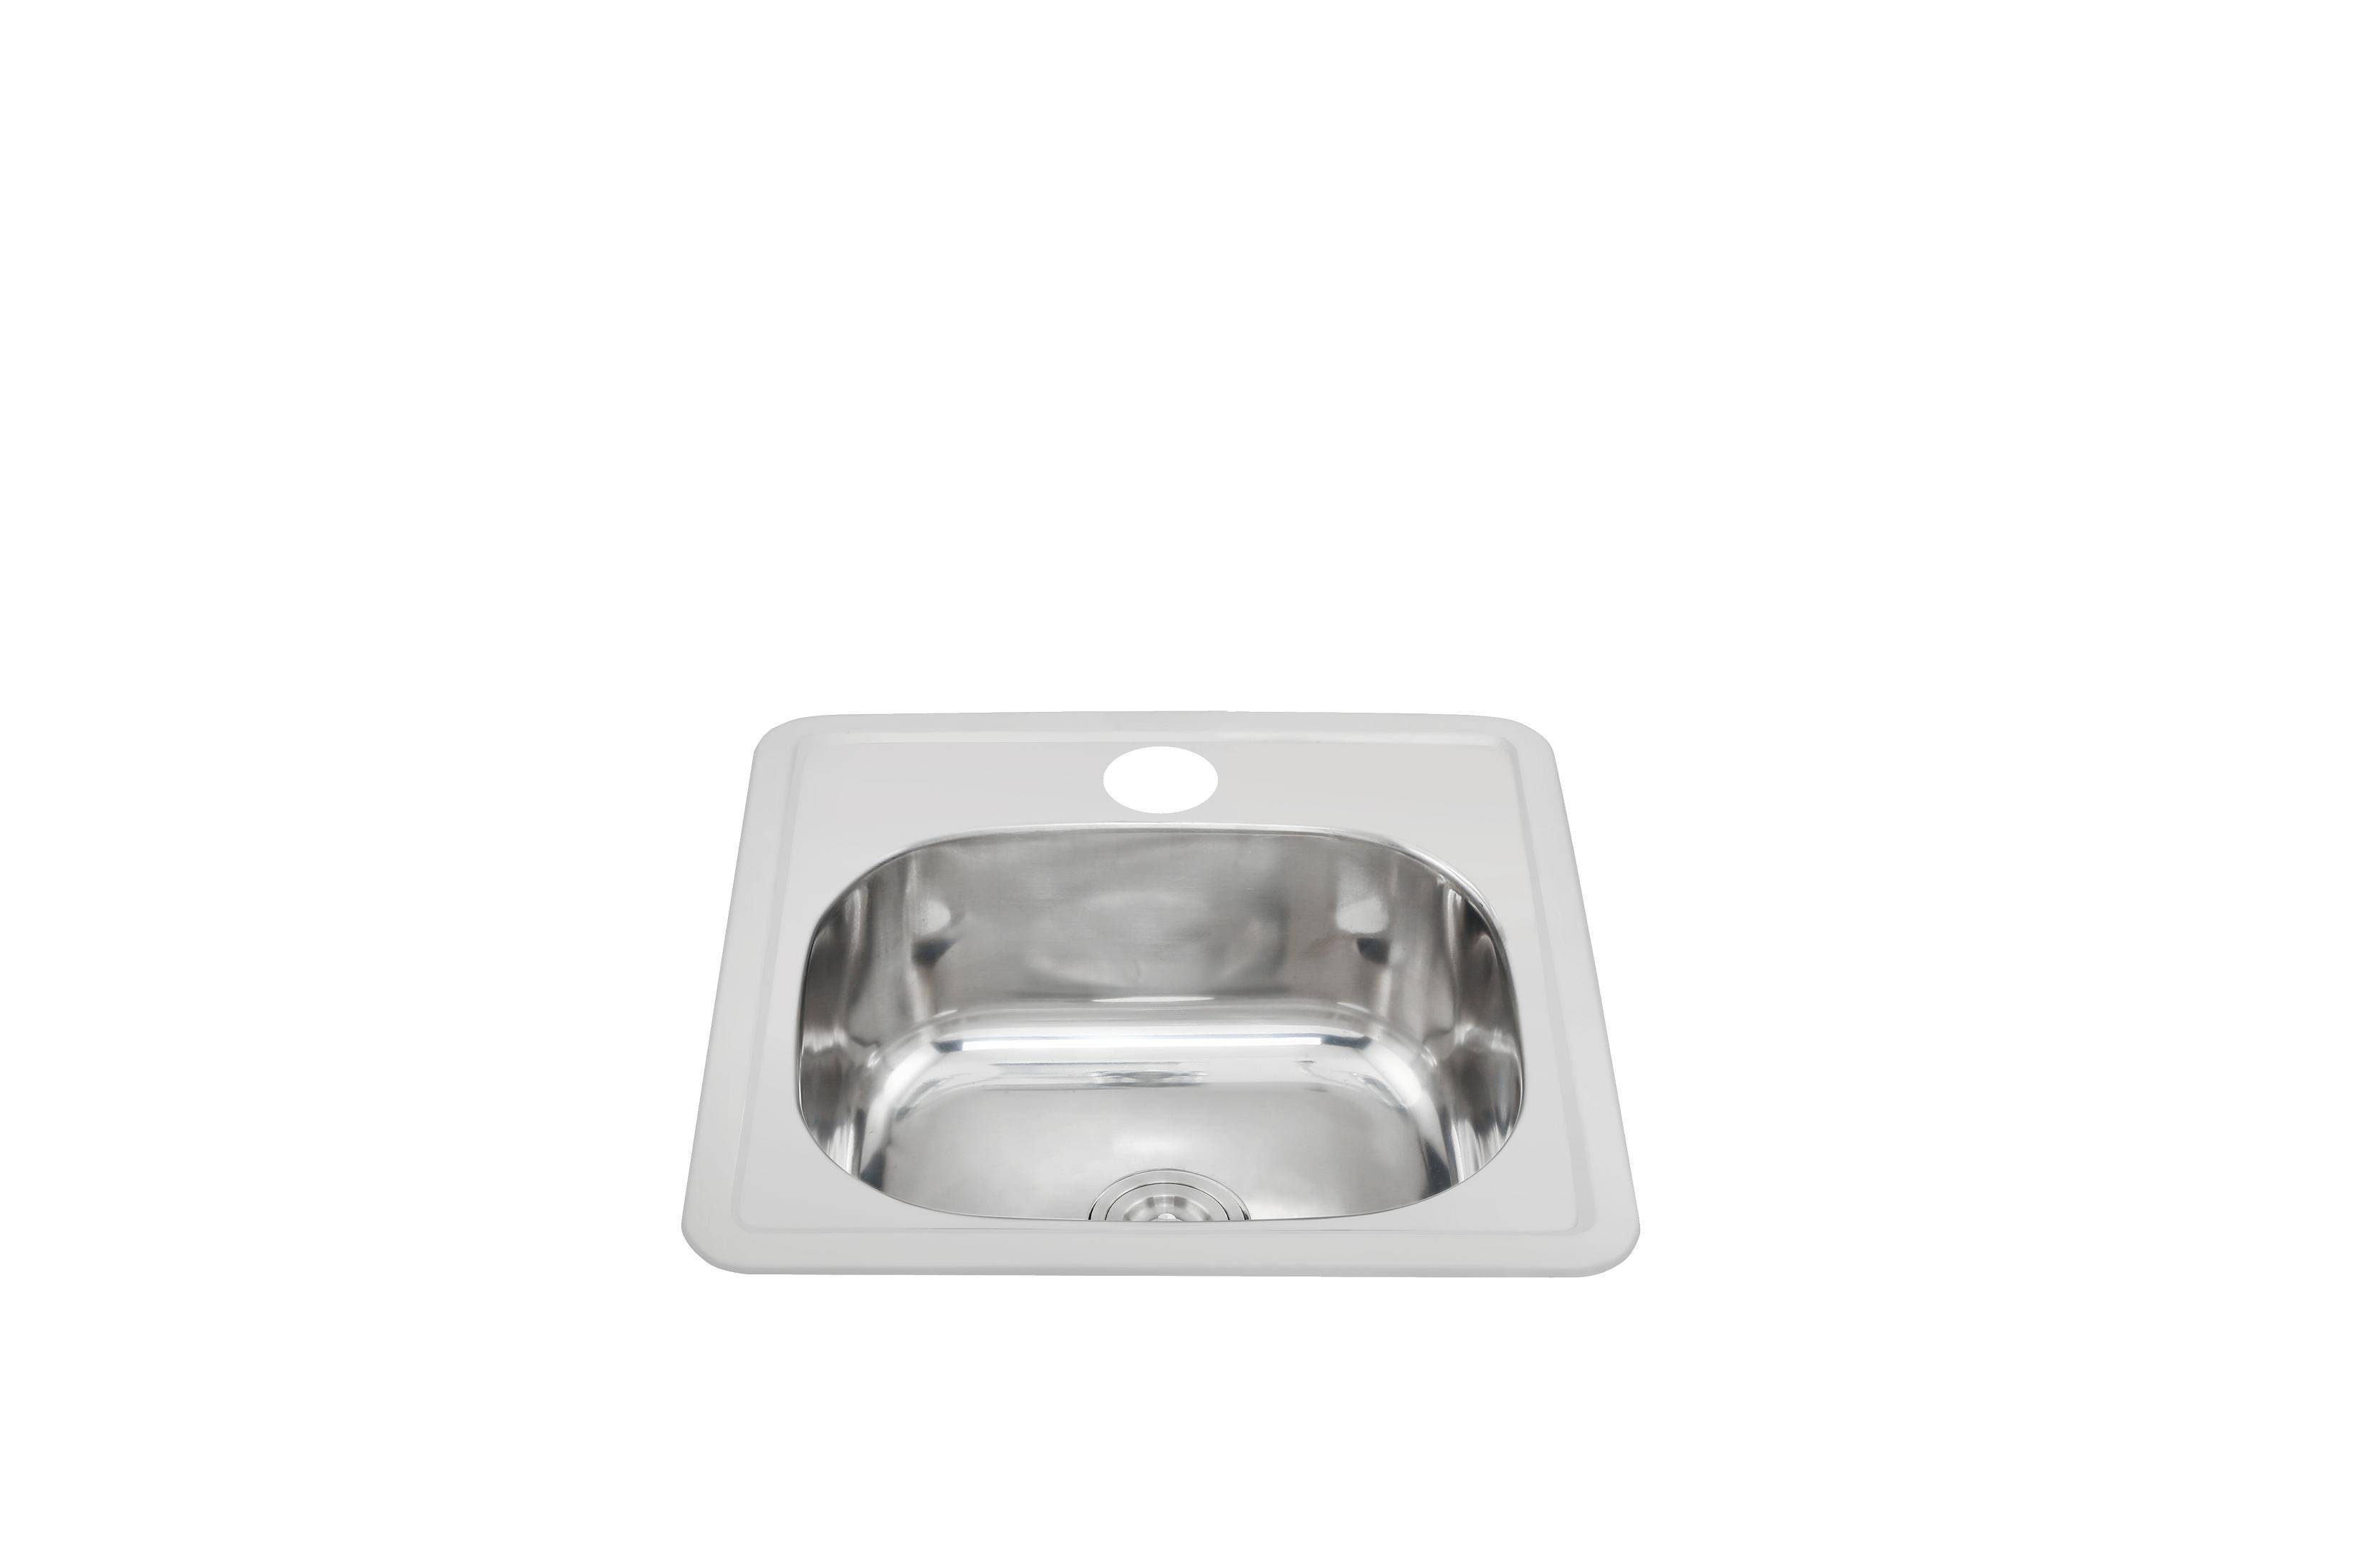 Small size cheap square bowl kitchen sink WY-3838A